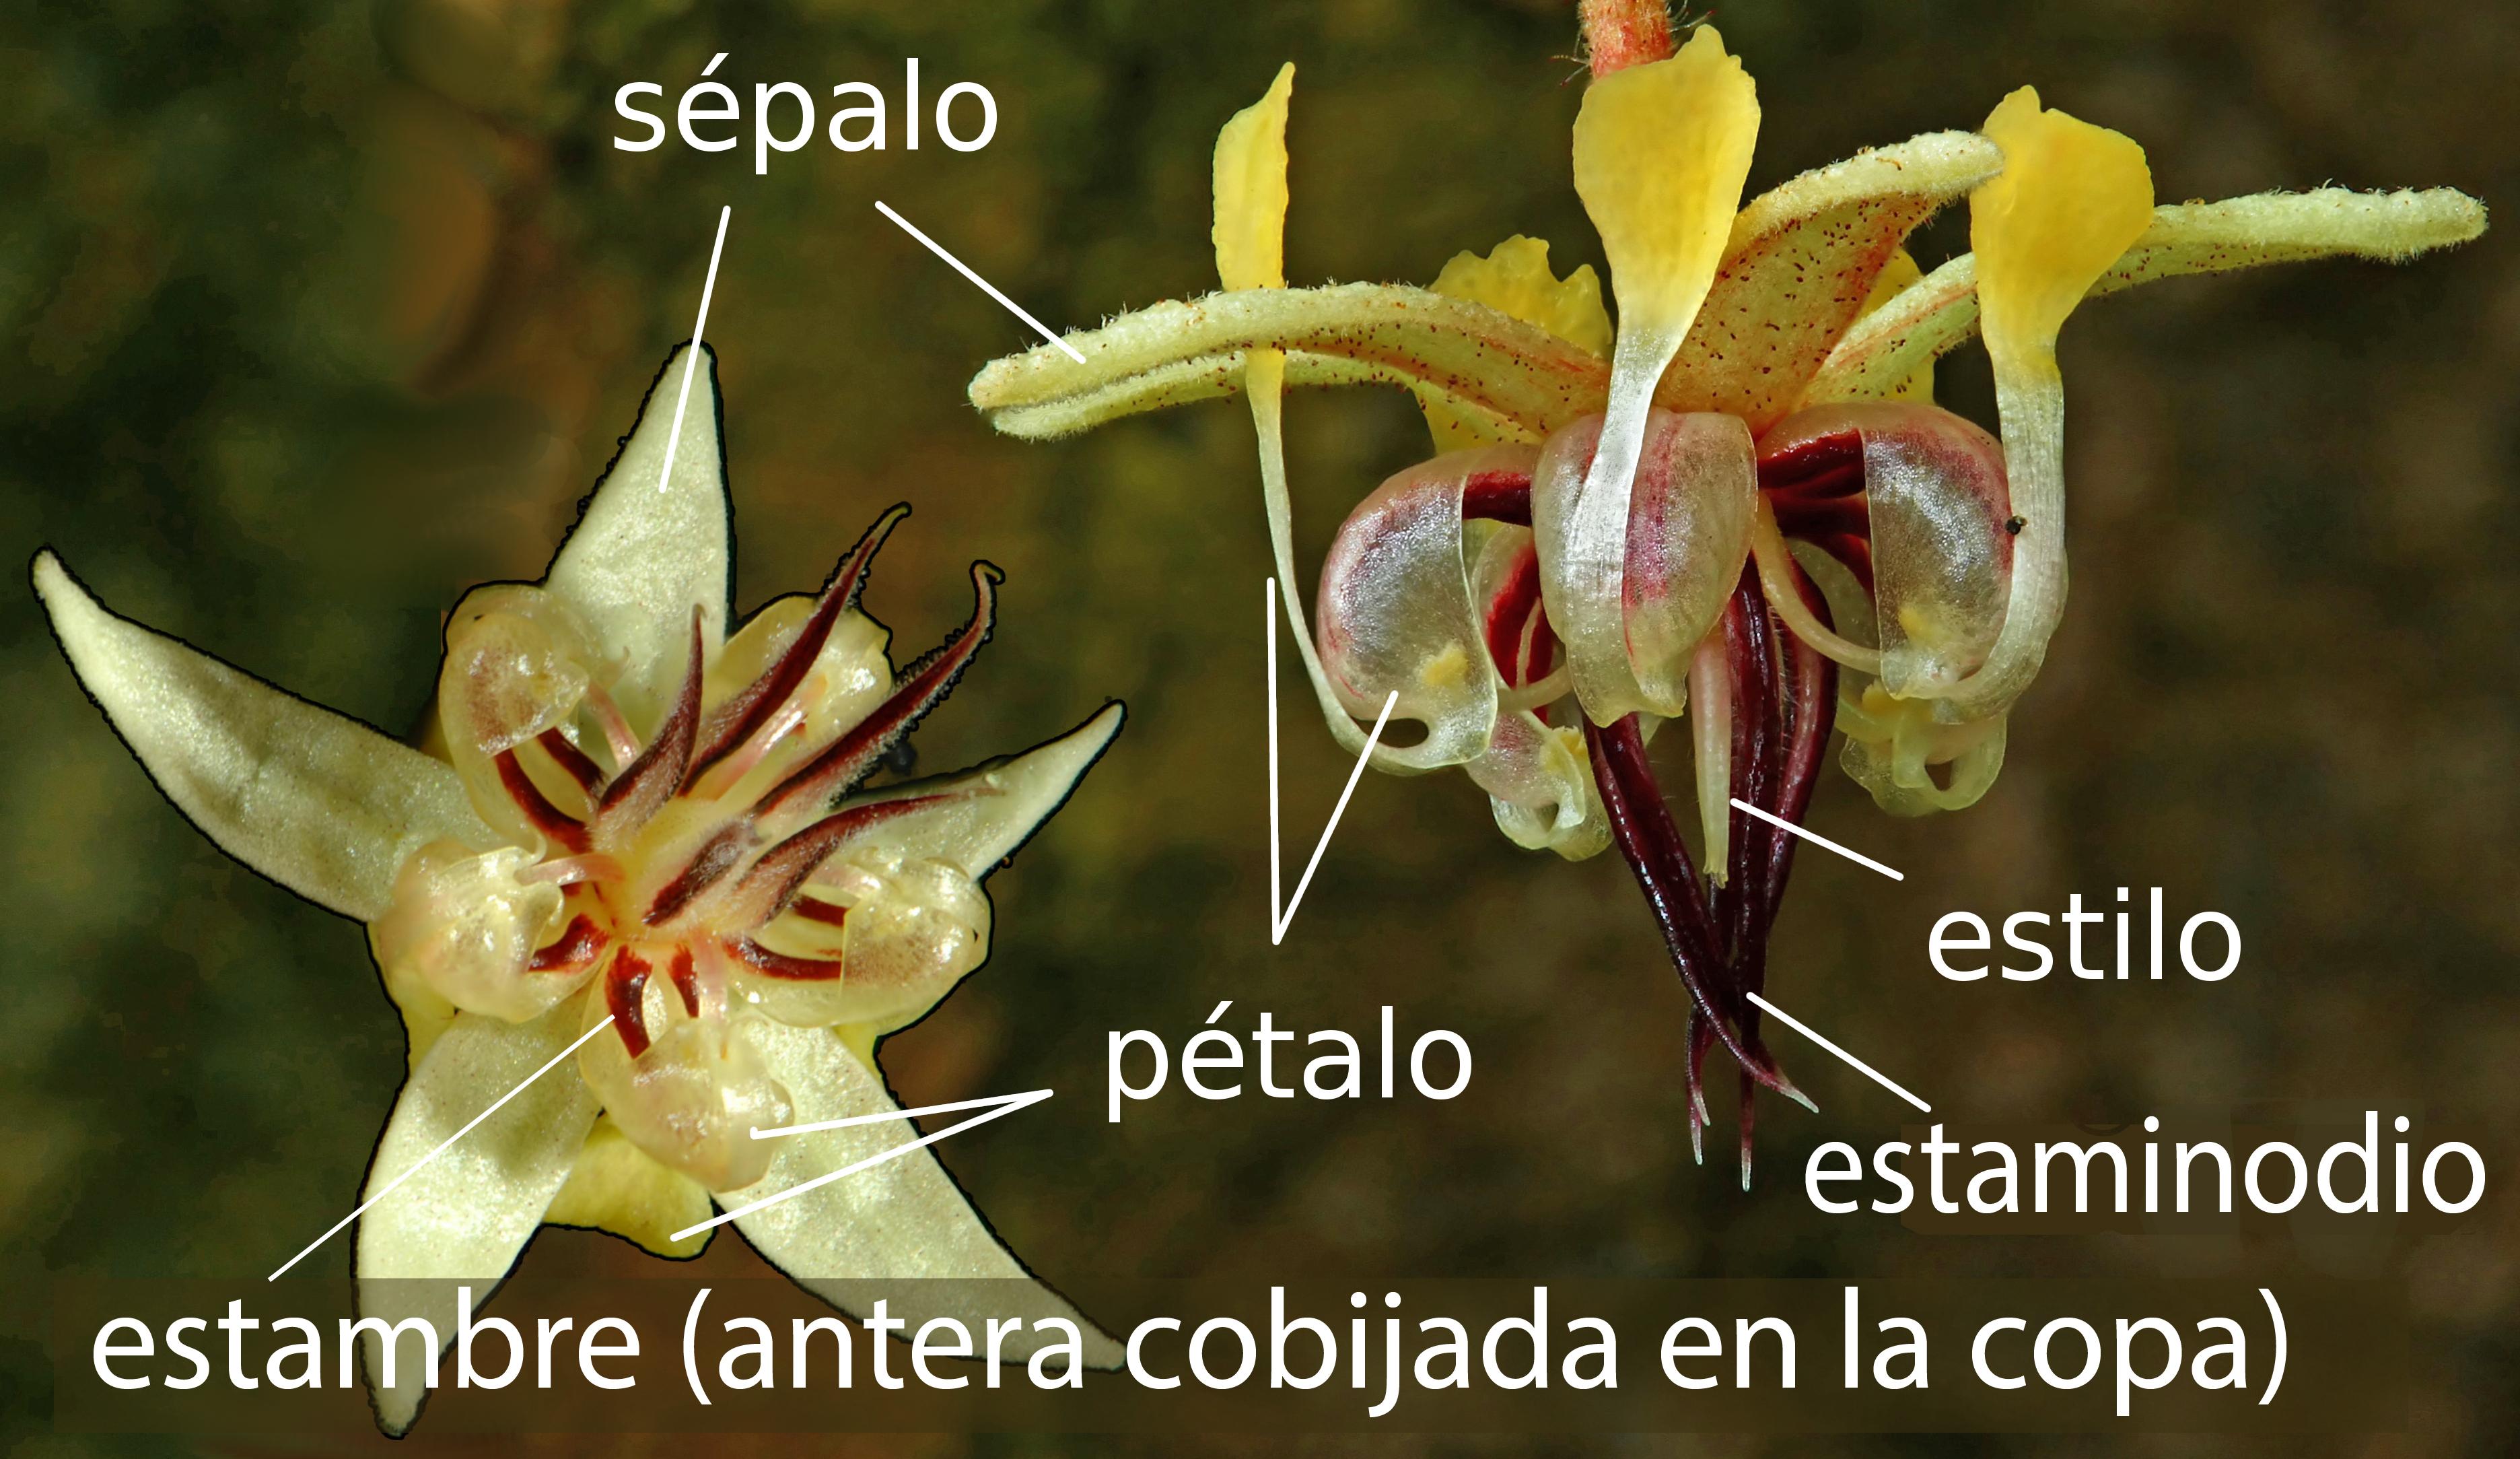 Filetheobroma cacao flower spanish labelsg wikimedia commons filetheobroma cacao flower spanish labelsg izmirmasajfo Image collections